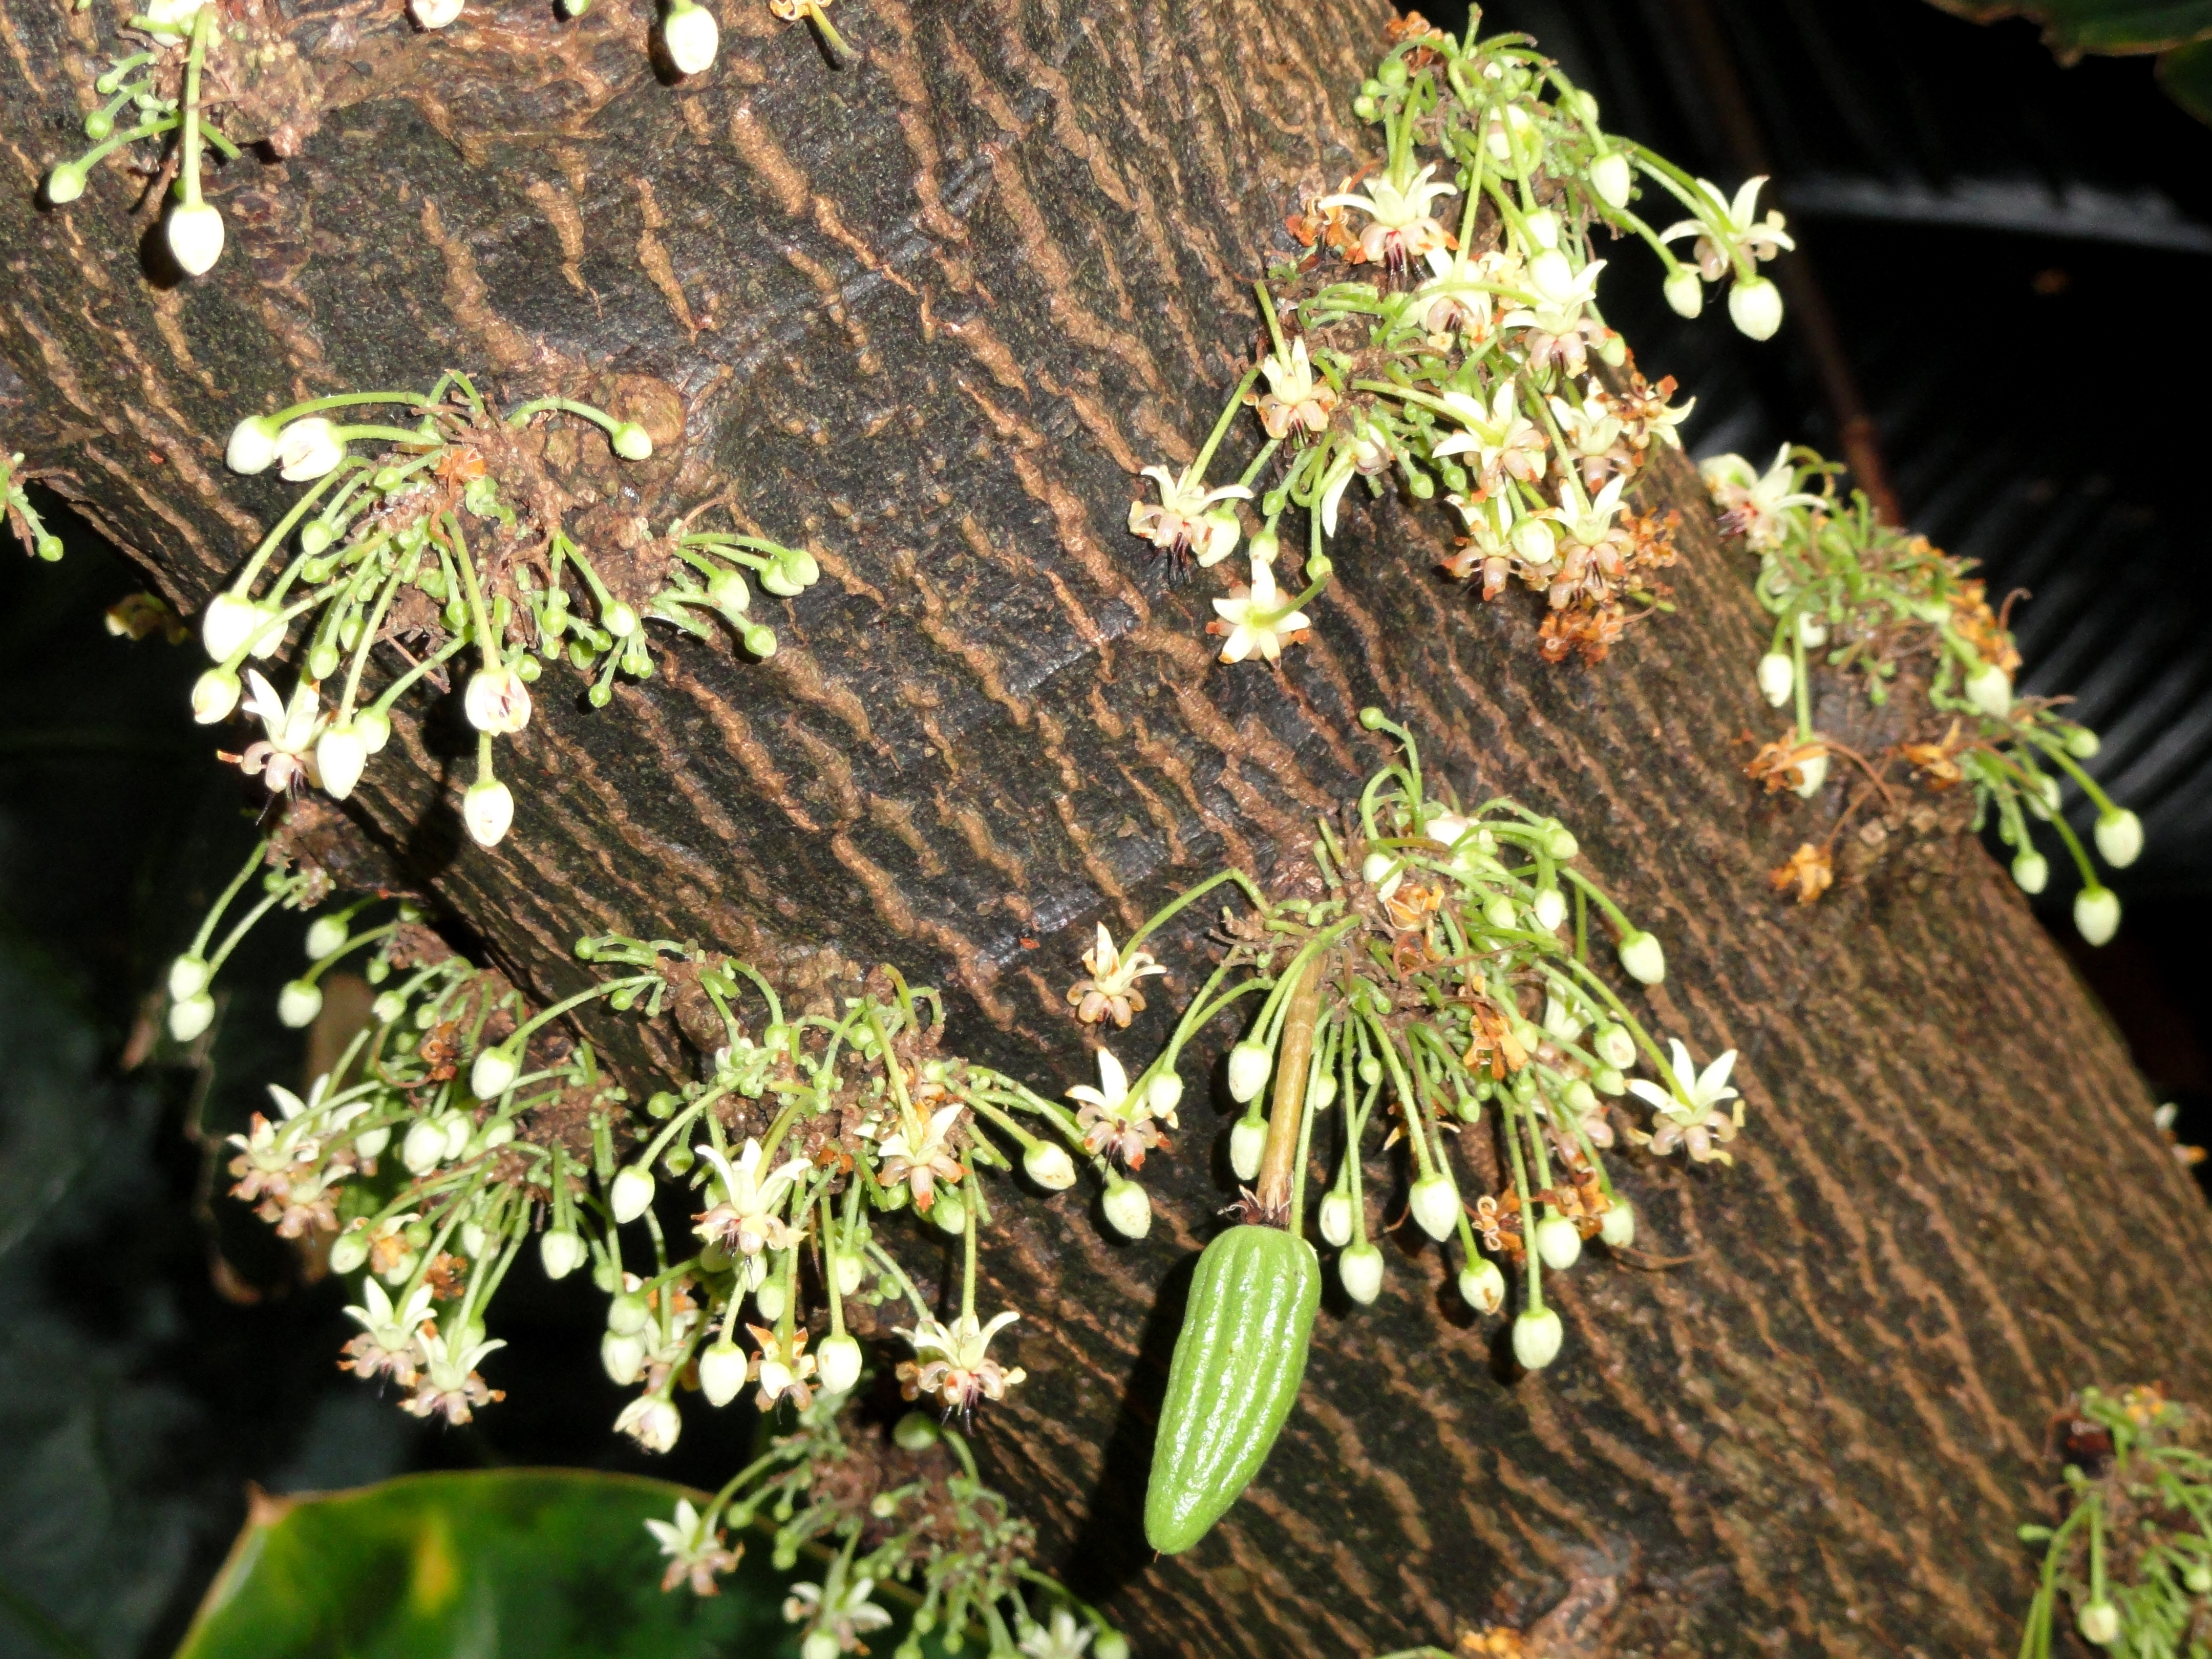 File:Theobroma cacao - Denver Botanic Gardens - DSC00898.JPG ...